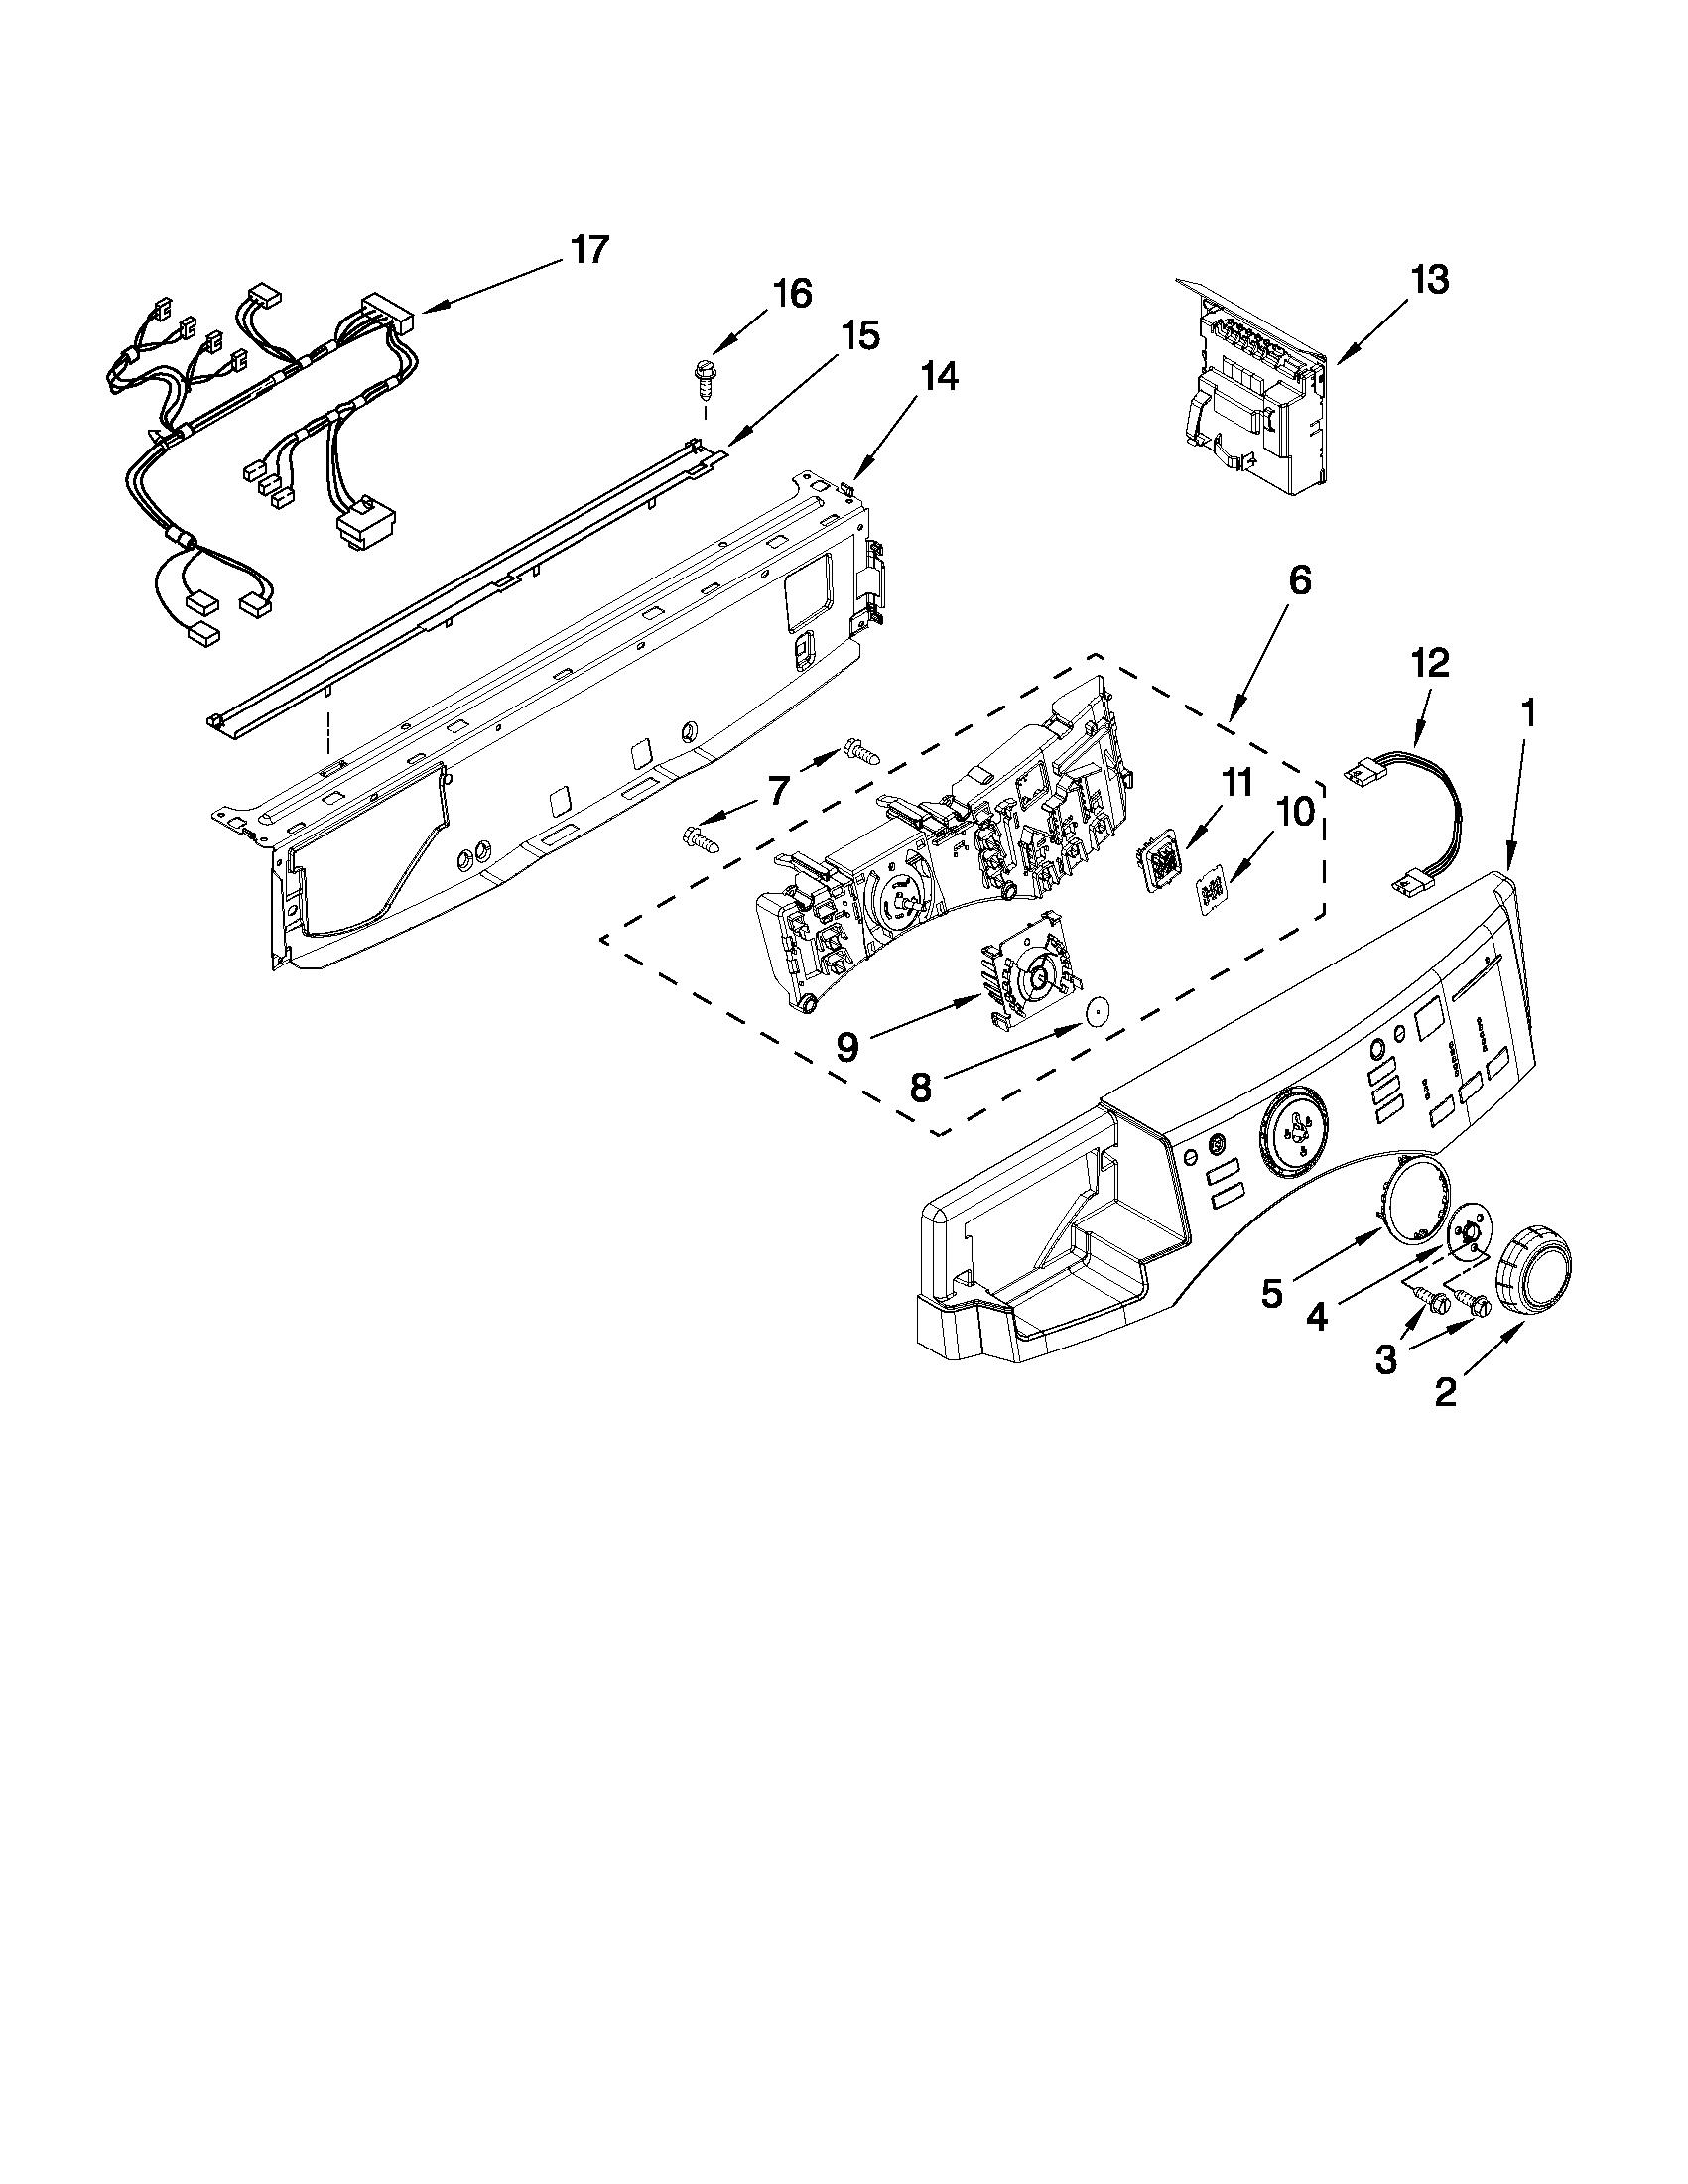 Maytag model MHWE950WW02 residential washers genuine parts